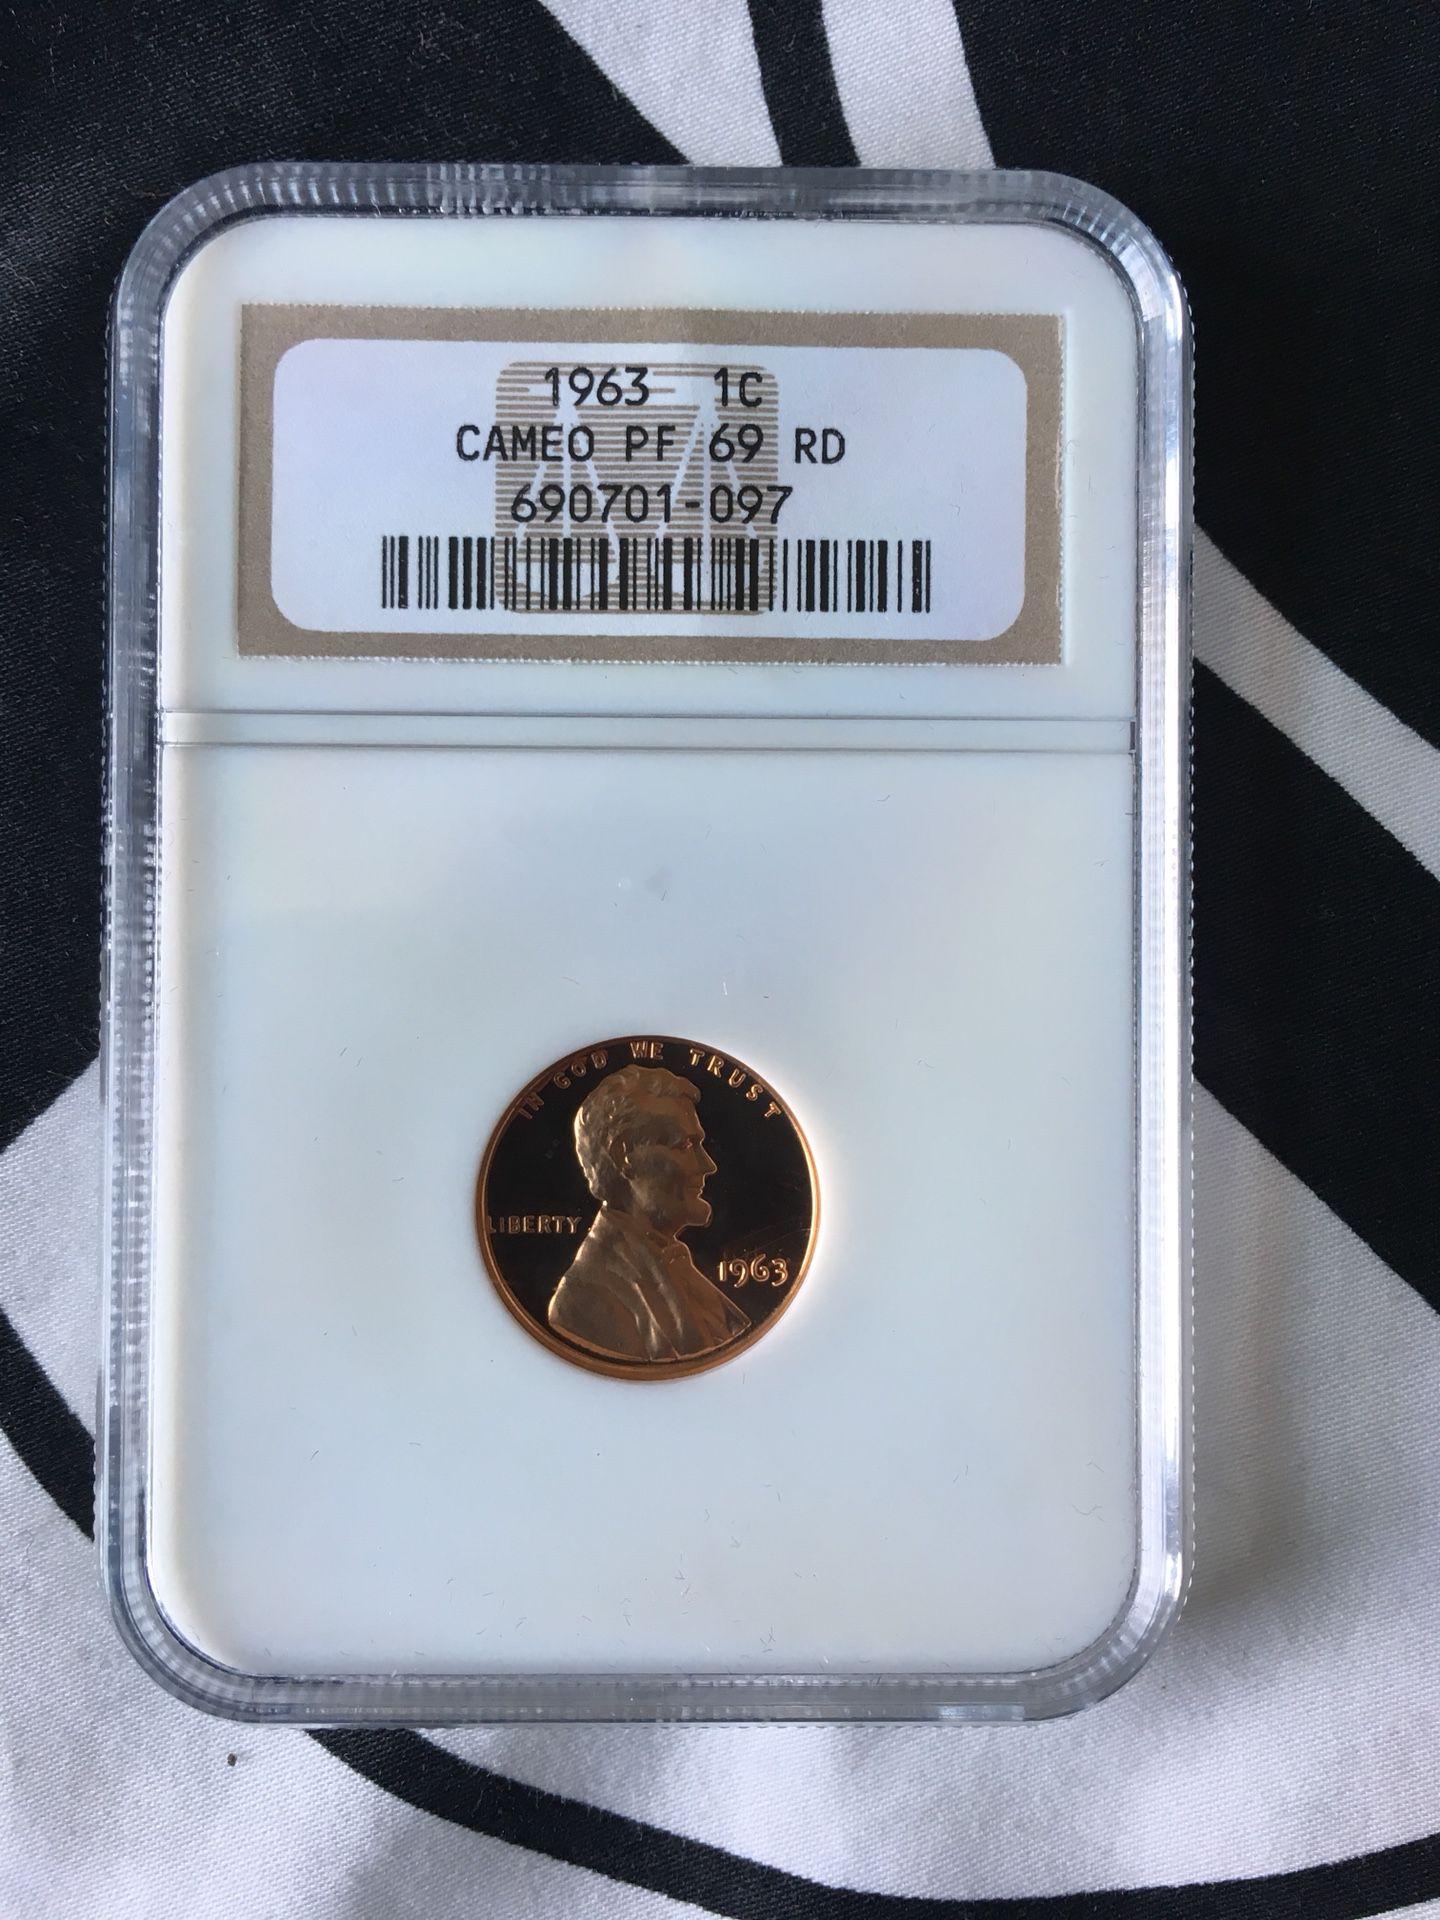 1963 Penny cameo